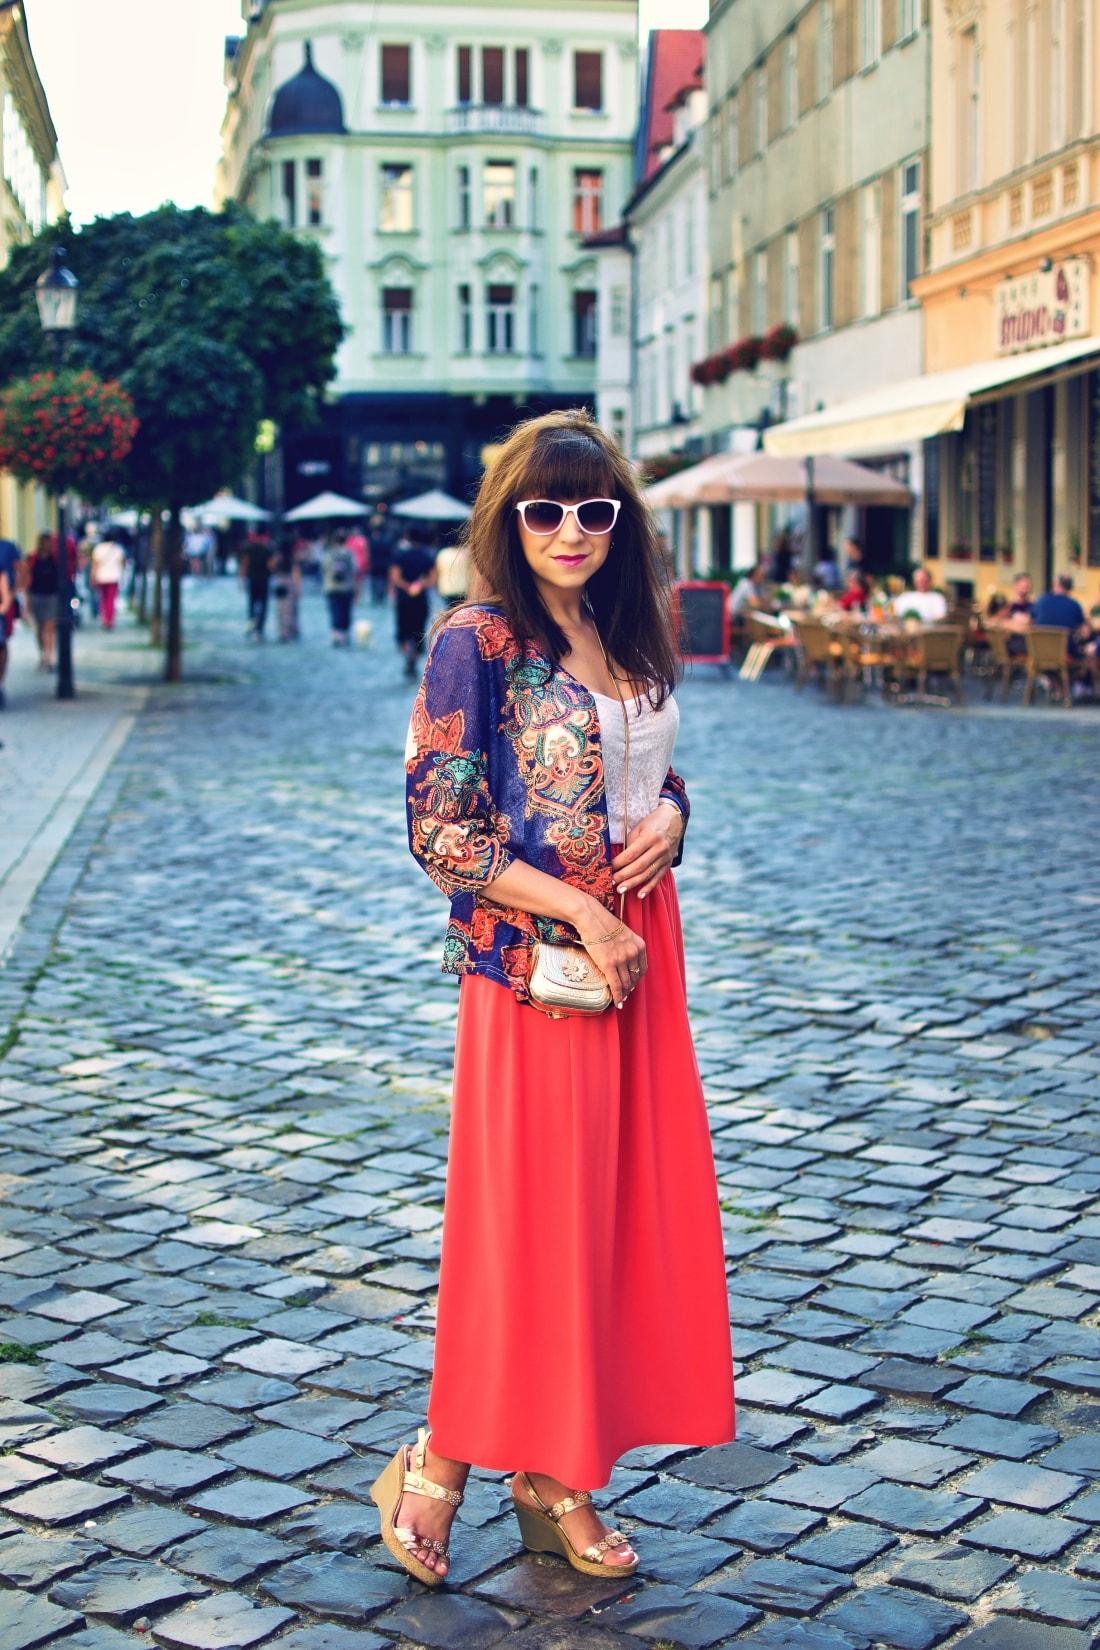 Purse jewel_Katharine fashion is beautiful blog 1_Mini bag_Kimono_Maxi_Handmade_Gold_Katarína Jakubčová_Fashion blogger